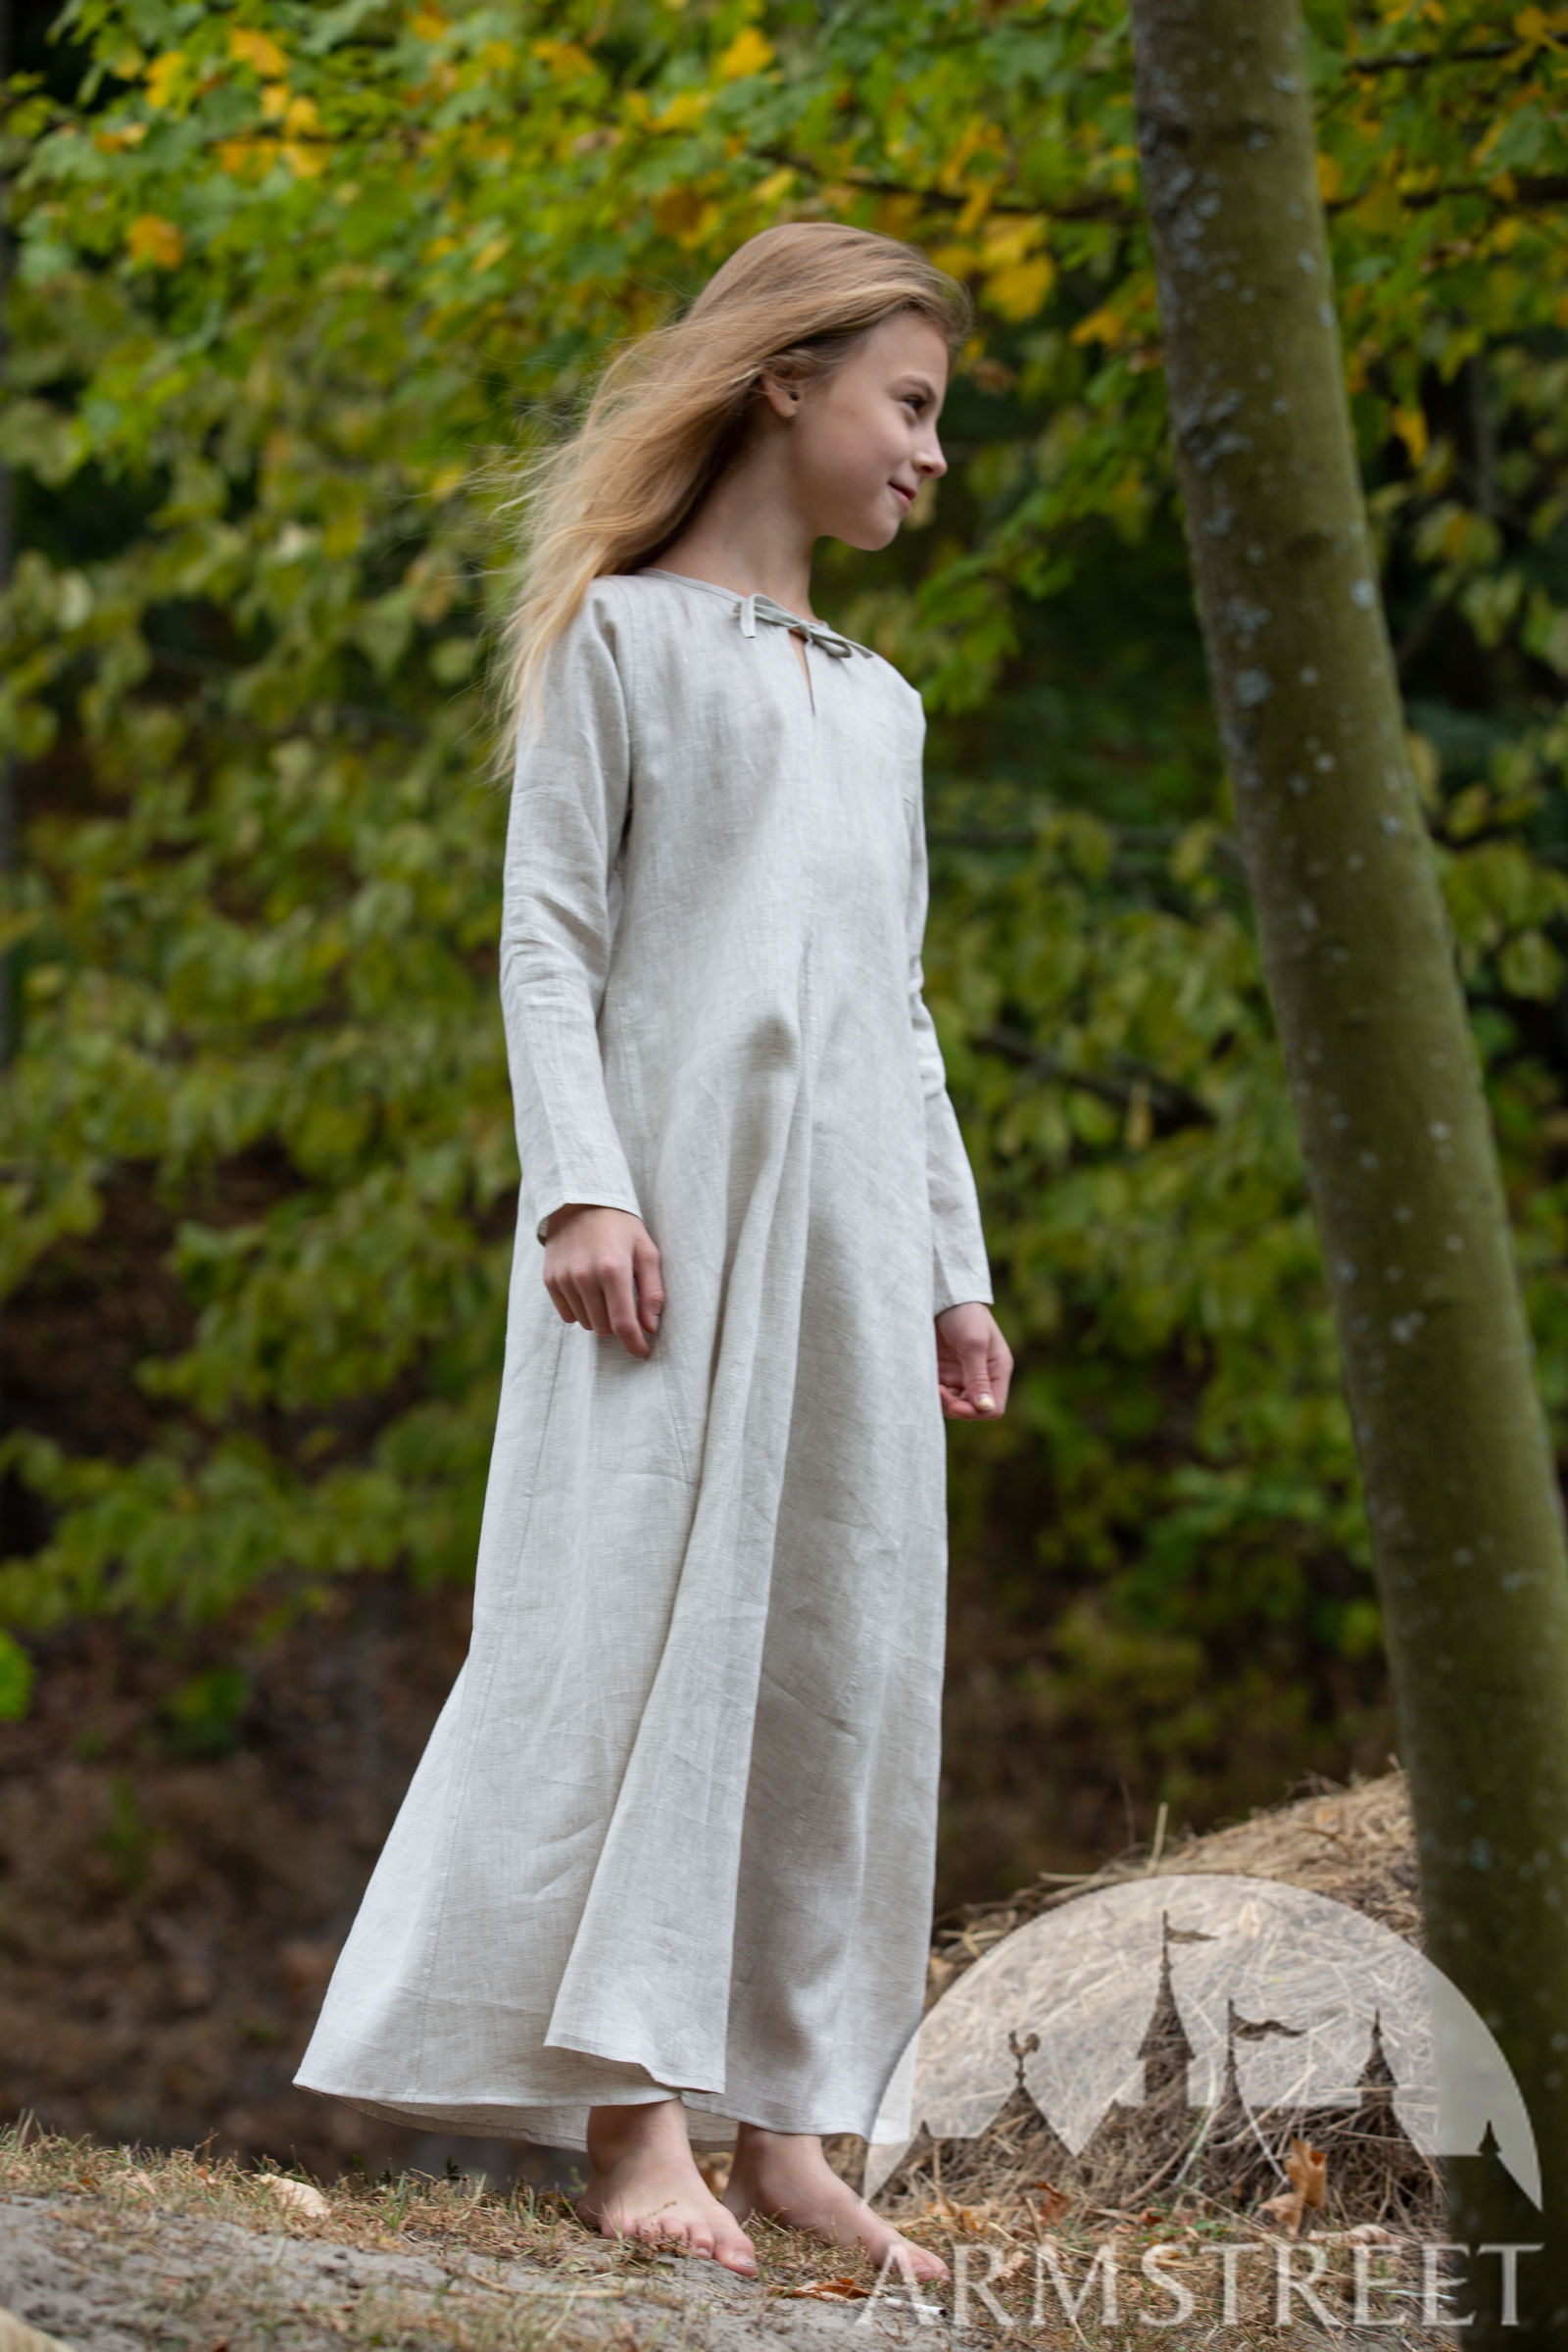 https://armstreet.com/catalogue/full/long-linen-underdress-chemise-for-kids-first-adventure-1.jpg